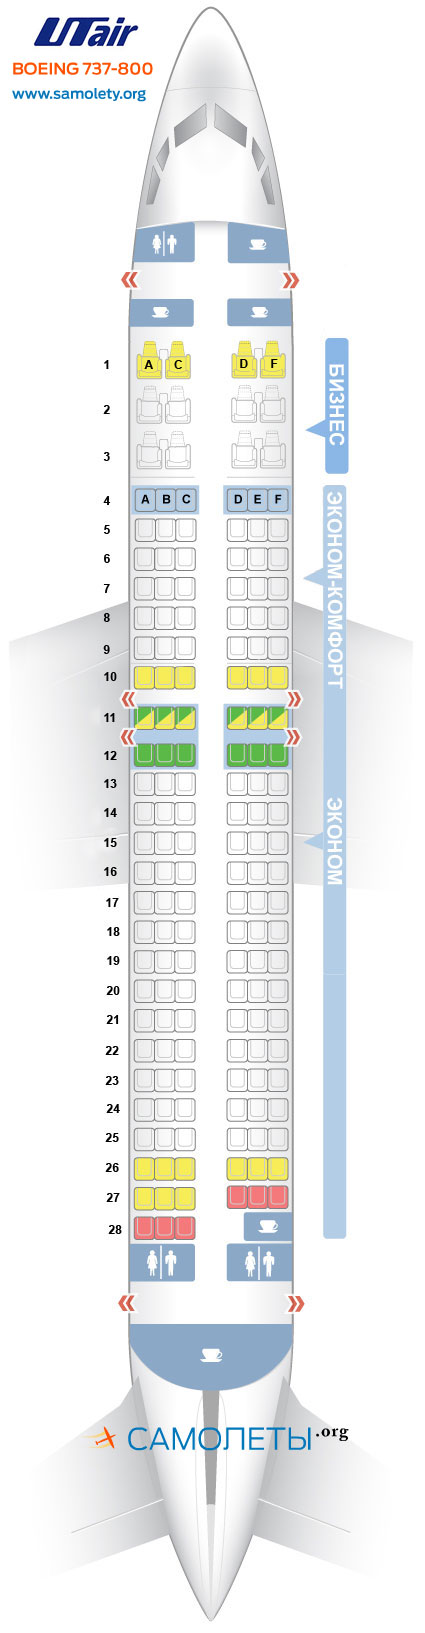 Схема салона самолет 737-800 Utair